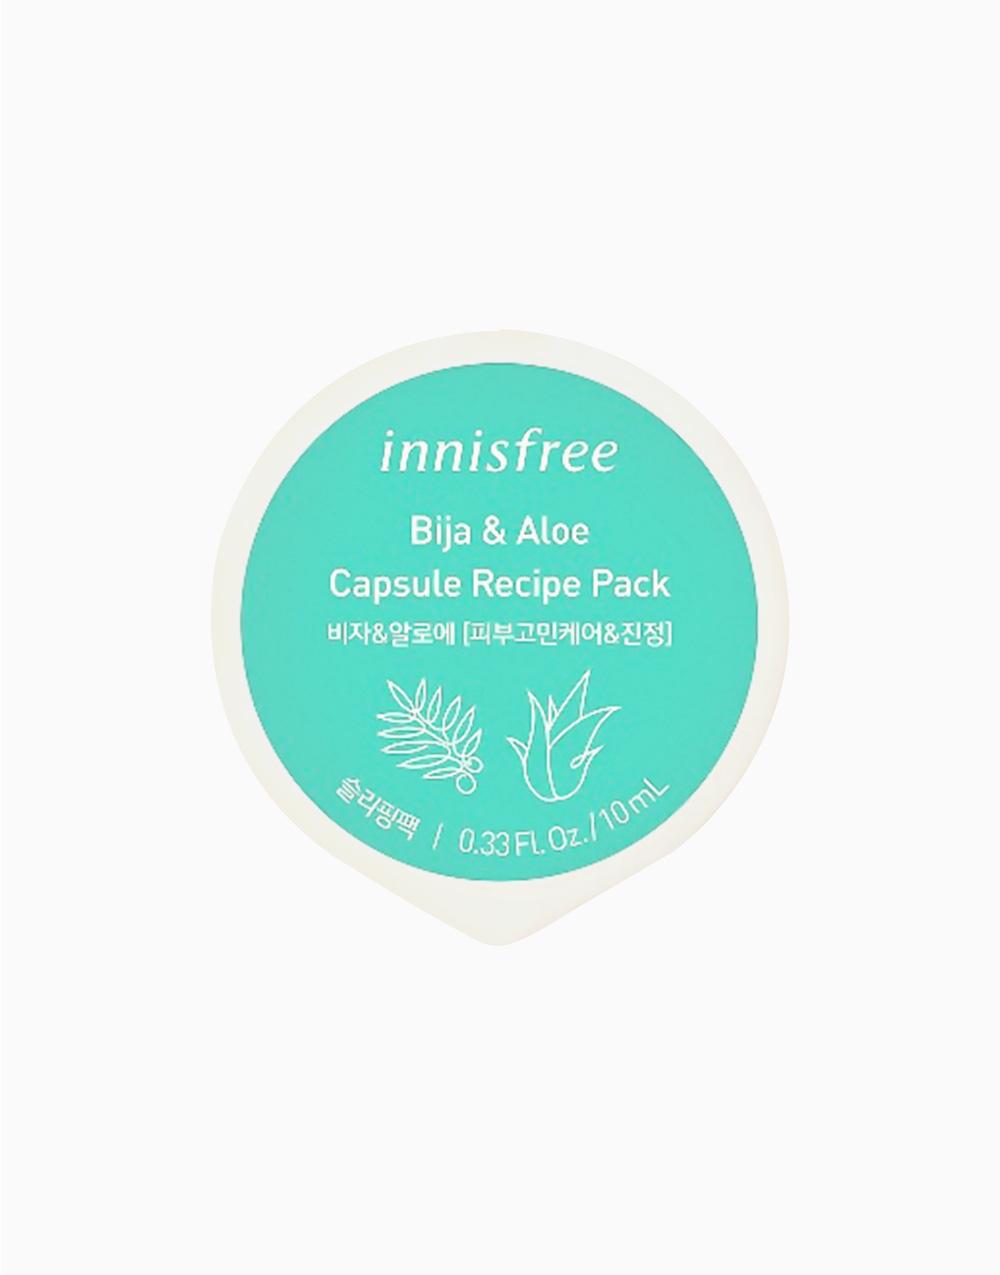 Bija & Aloe Capsule Recipe Pack by Innisfree